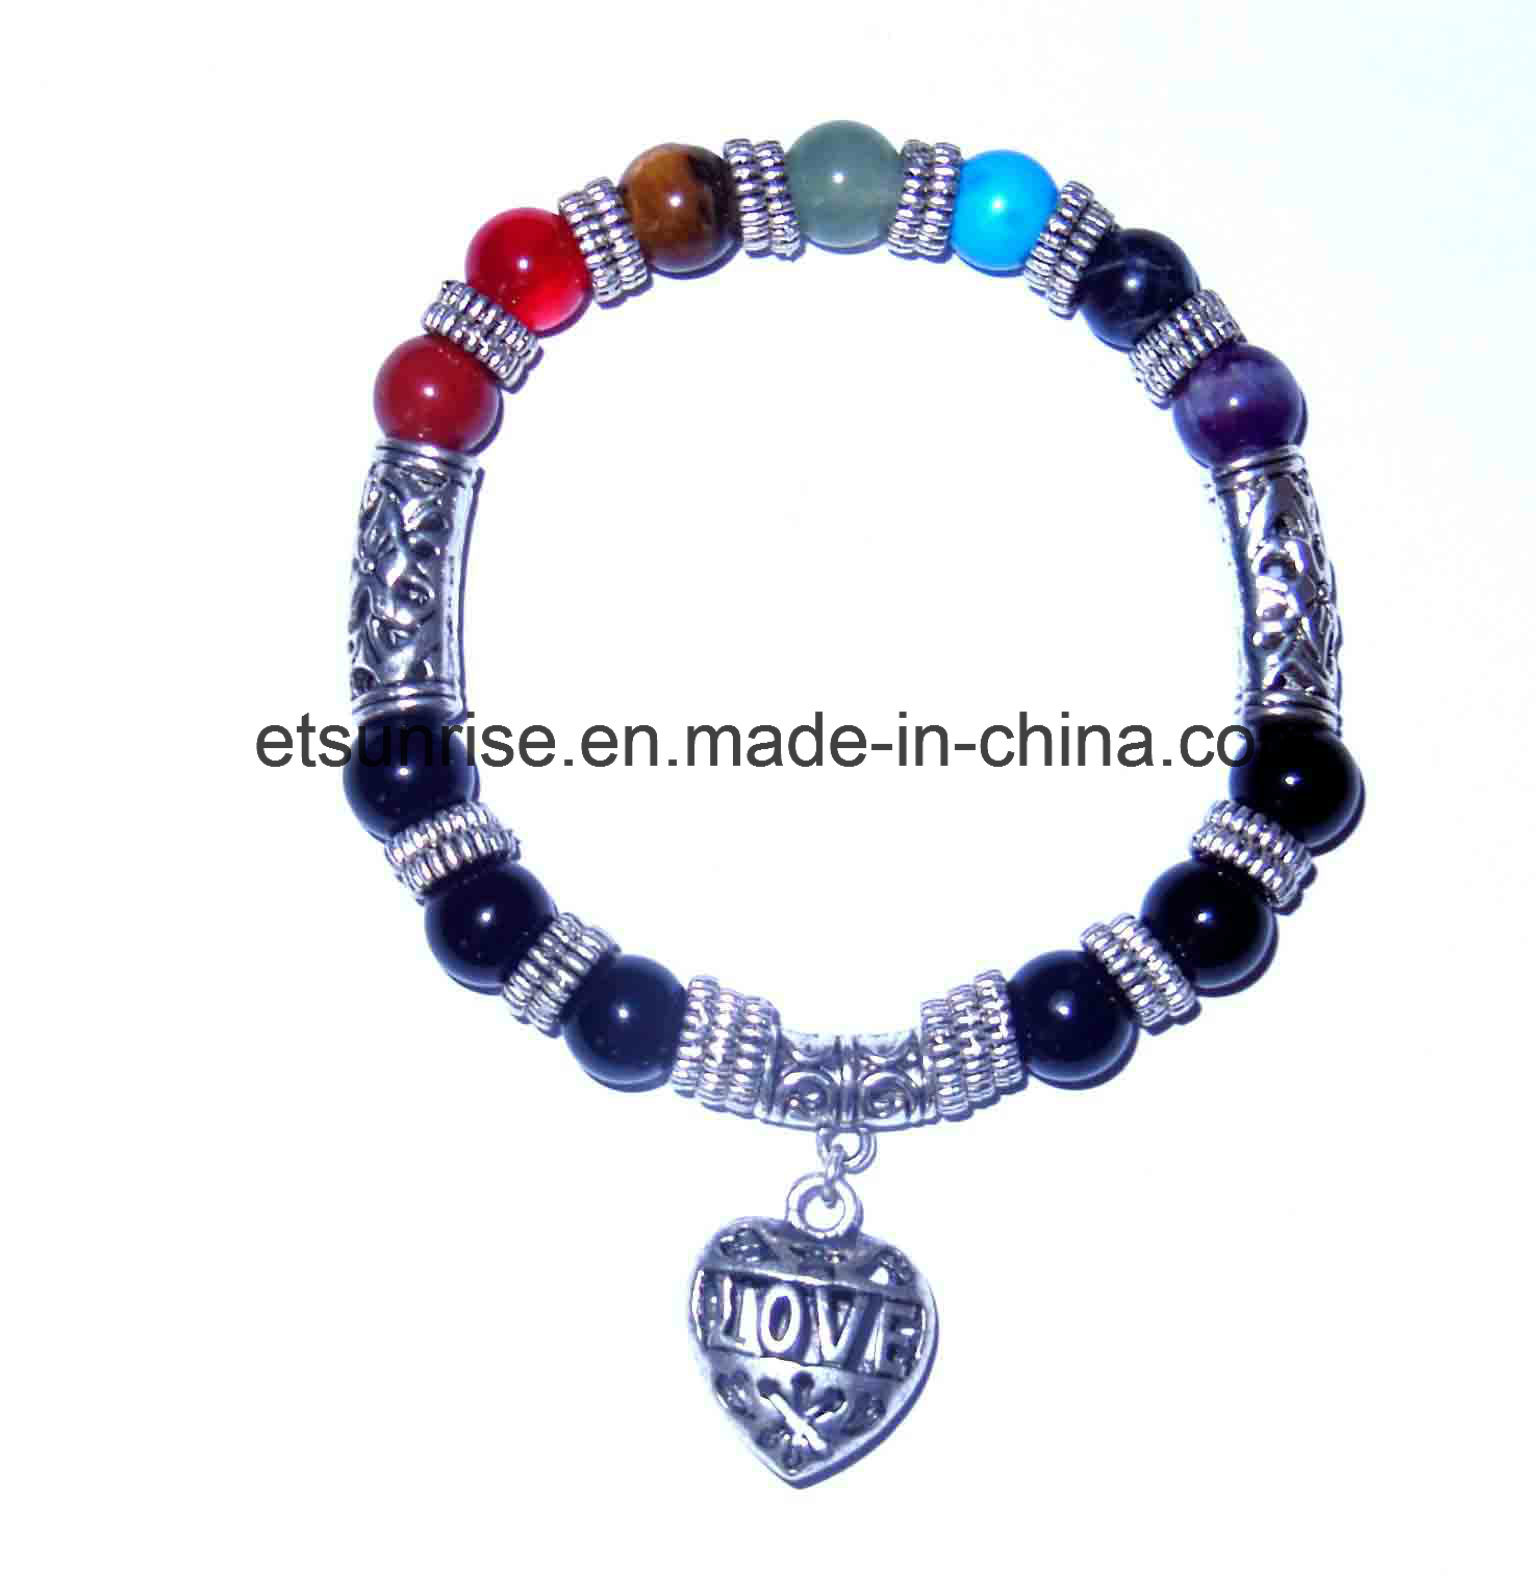 Natural Semi Precious Stone Crystal Beaded Charming Bracelet Gemstone Jewelry